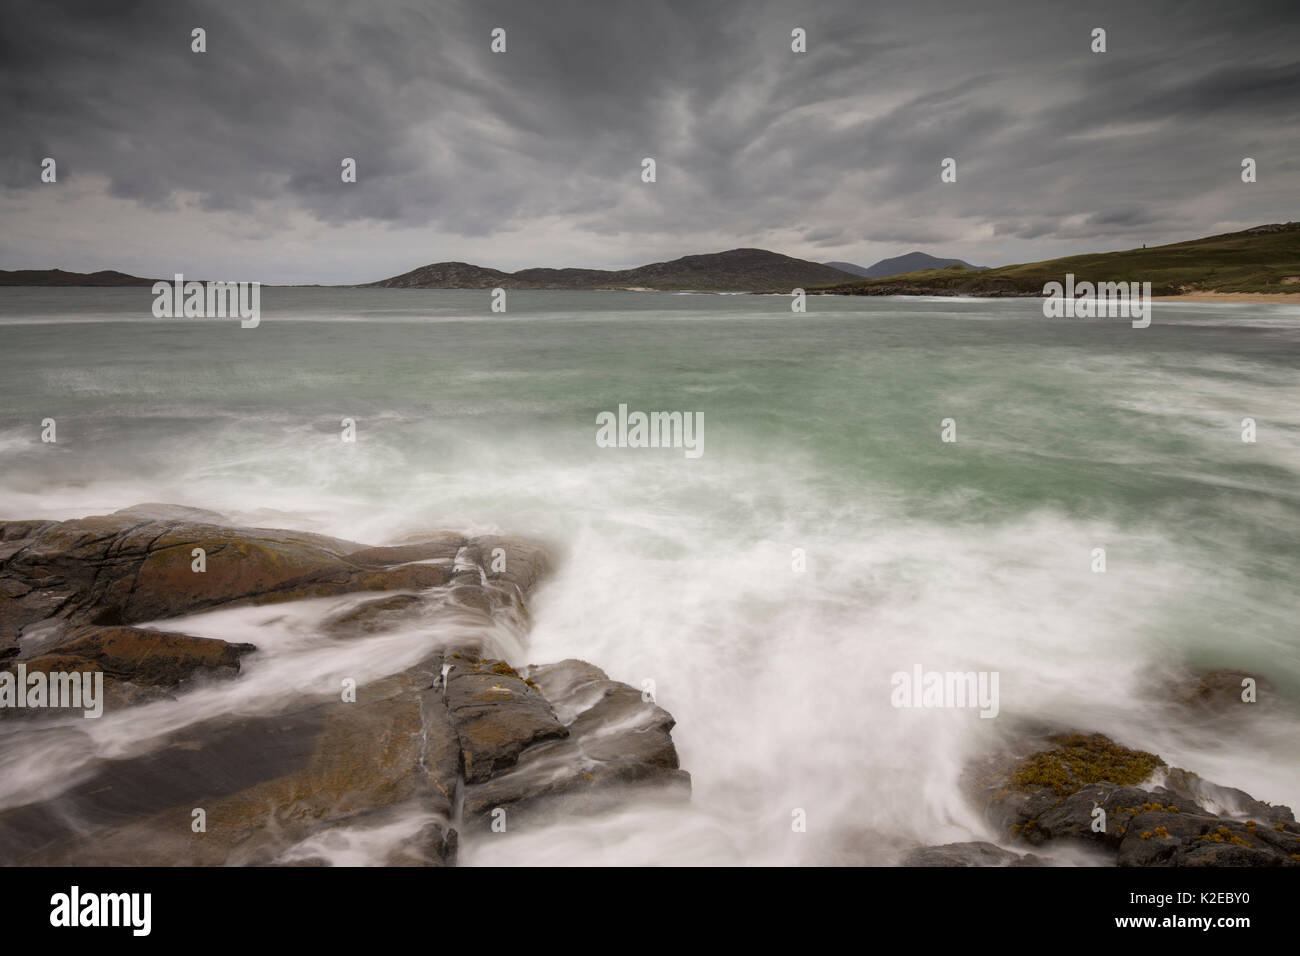 Stormy seas across Sound of Taransay, West Harris,  Outer Hebrides, Scotland, UK, September 2014. - Stock Image